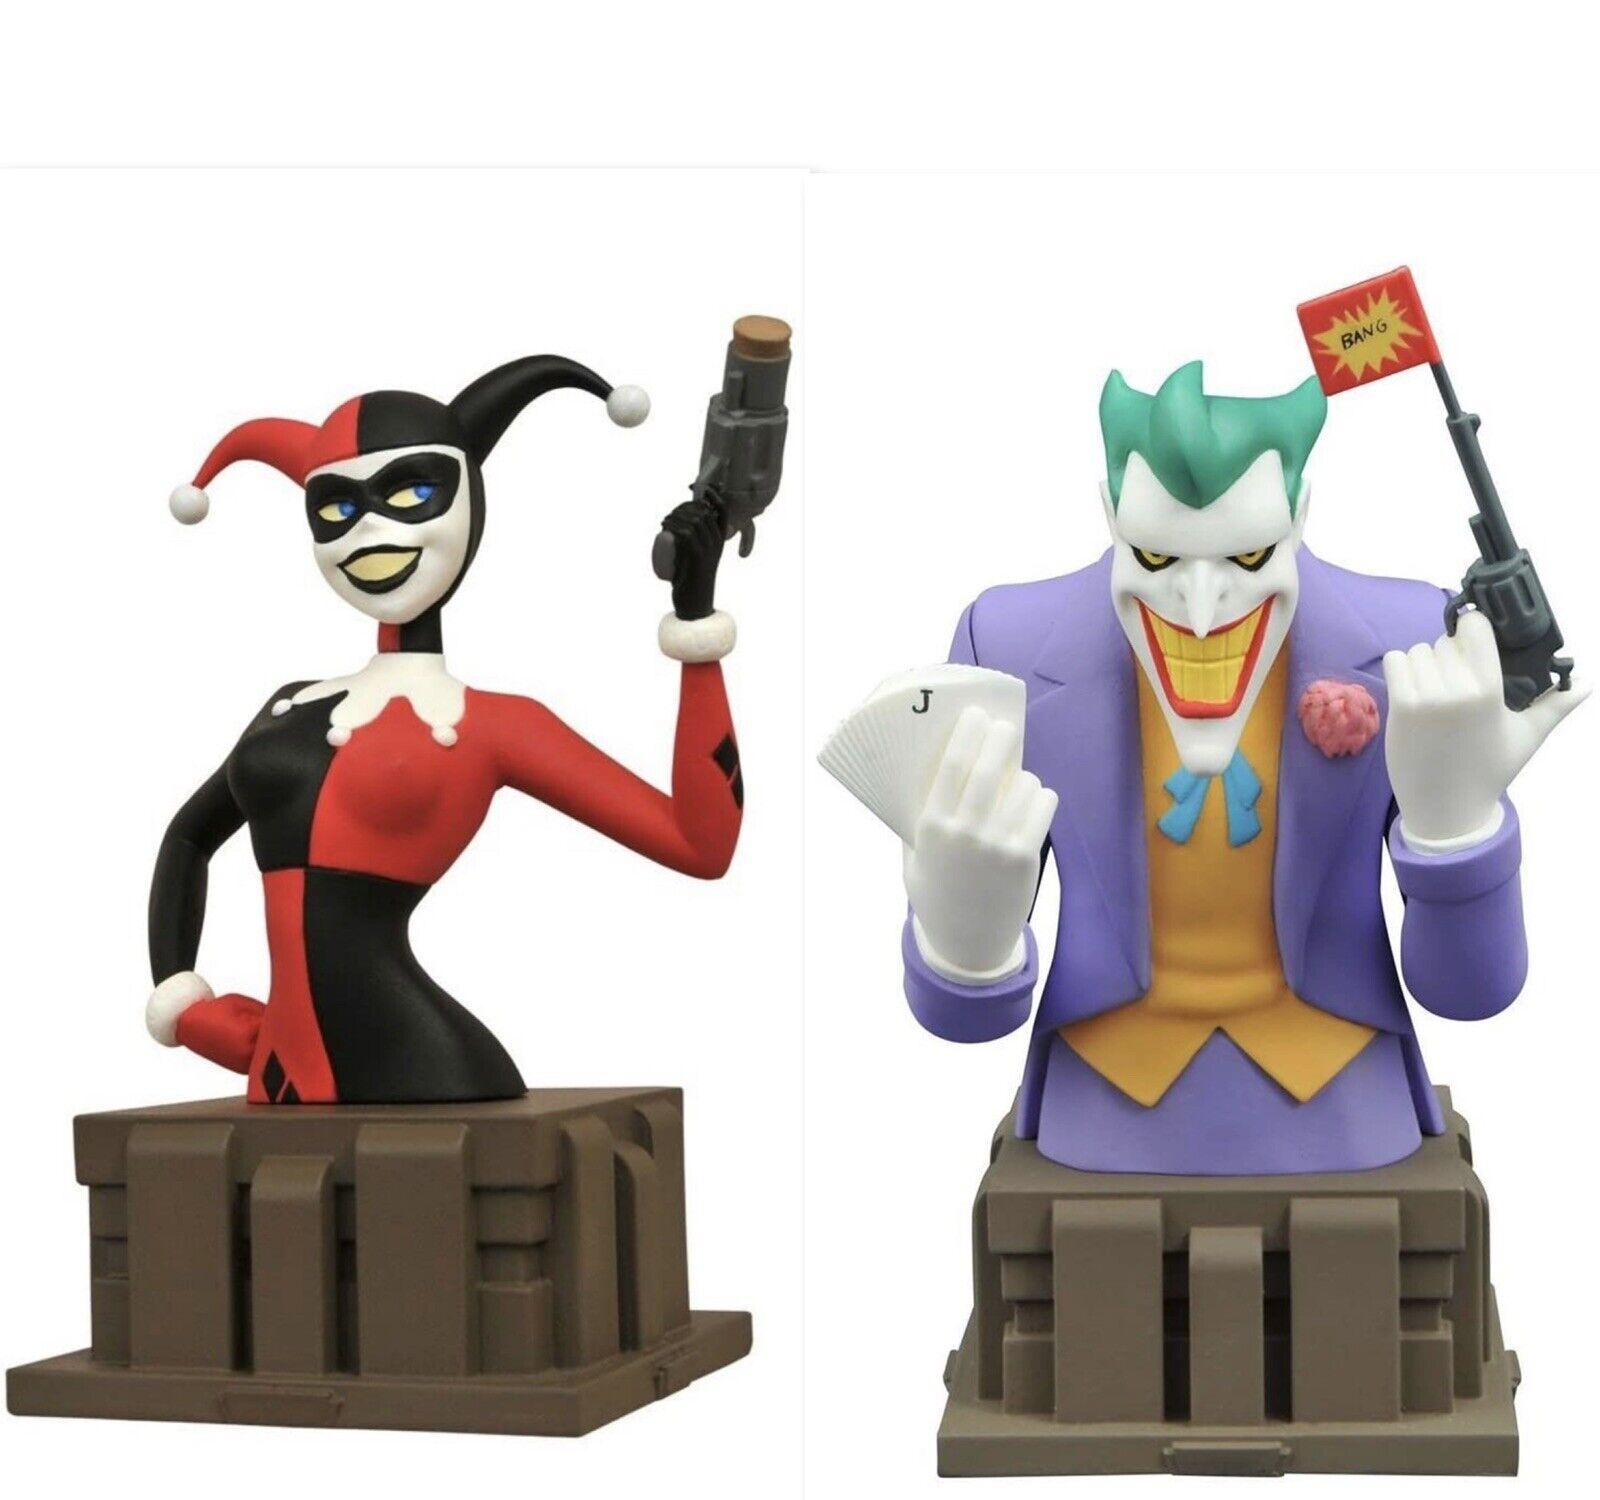 Diamond Dc Comics Batman Animated Series Harley Quinn 1866 The Joker Bust 1764 For Sale Online